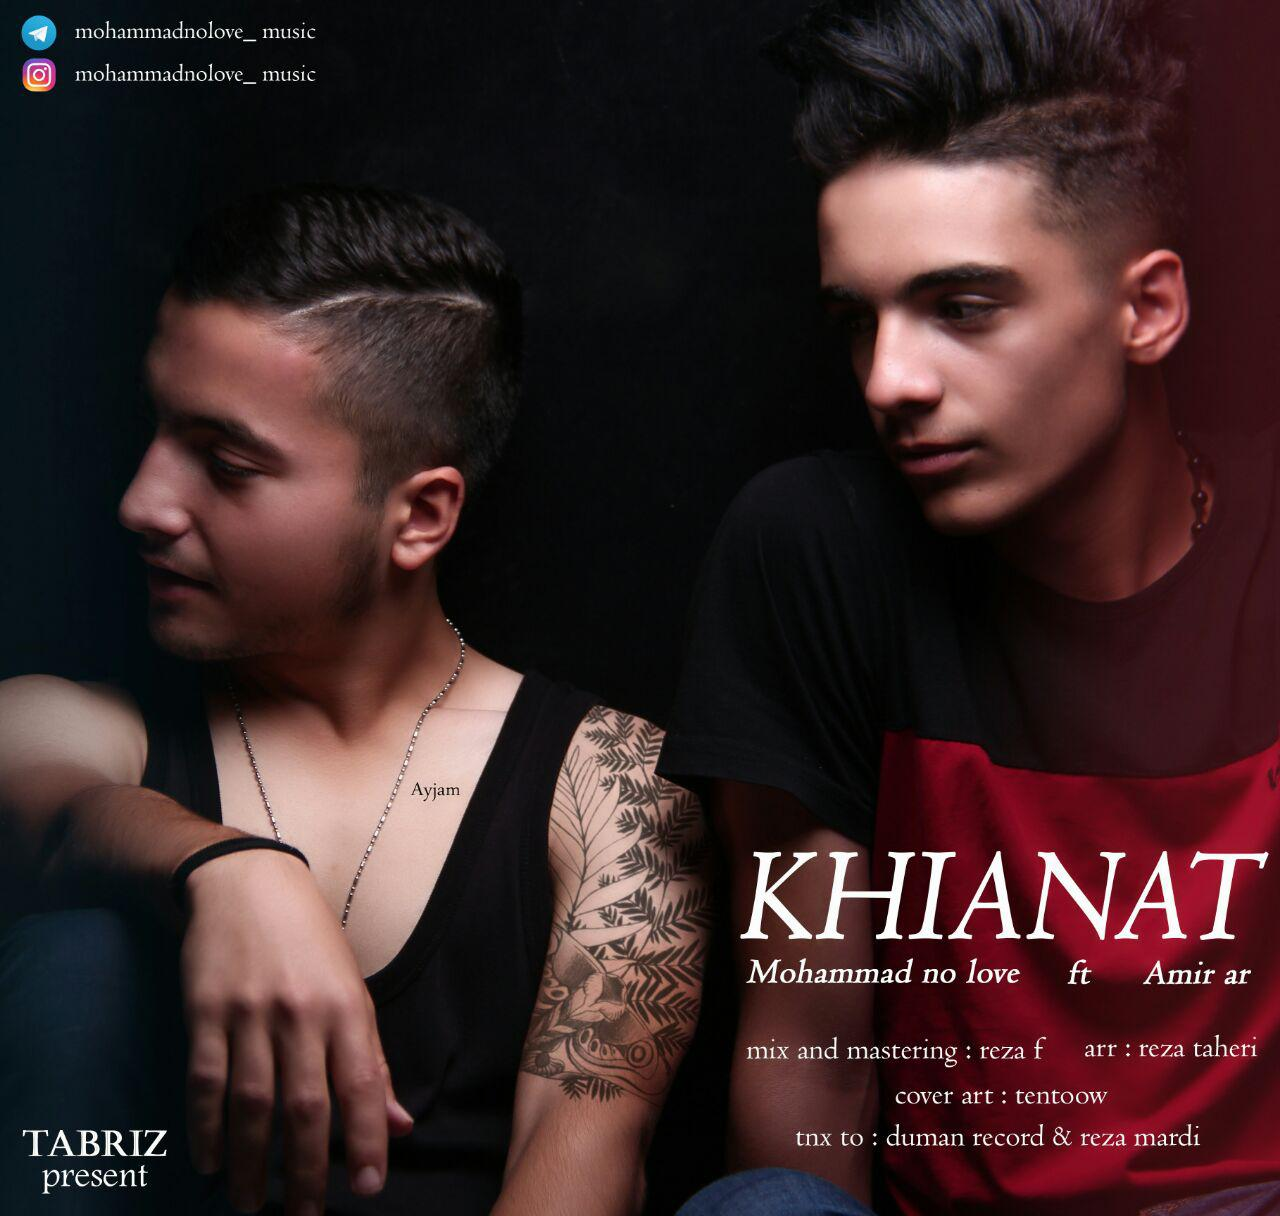 http://s9.picofile.com/file/8329980226/35Mohammad_No_Love_Ft_Amir_Ar_Khianat.jpg